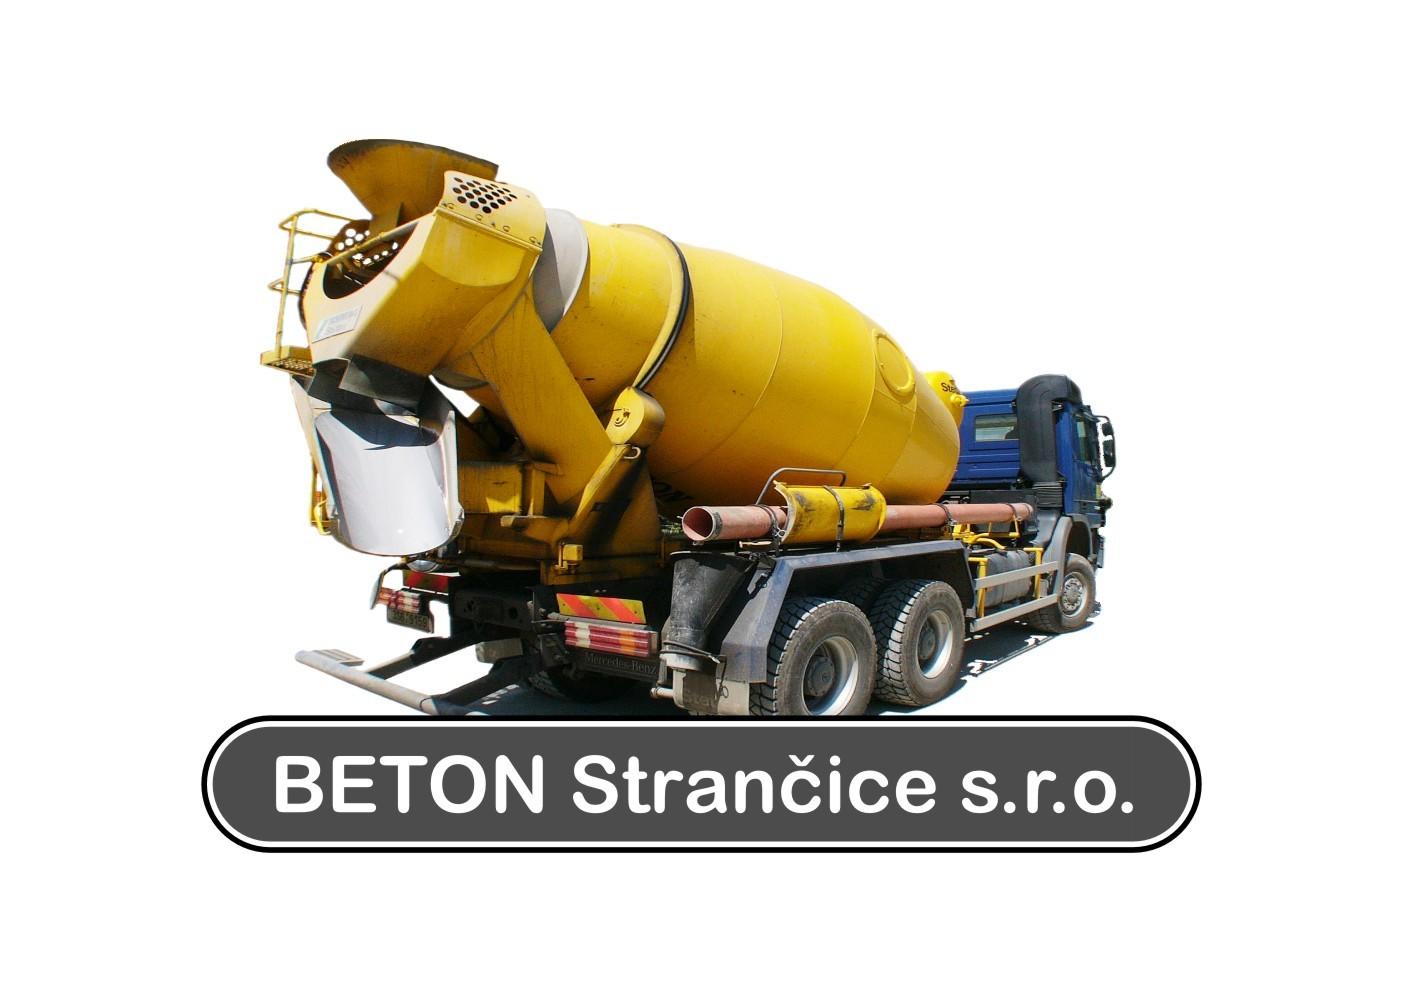 logo firmy BETON Stranèice s.r.o.